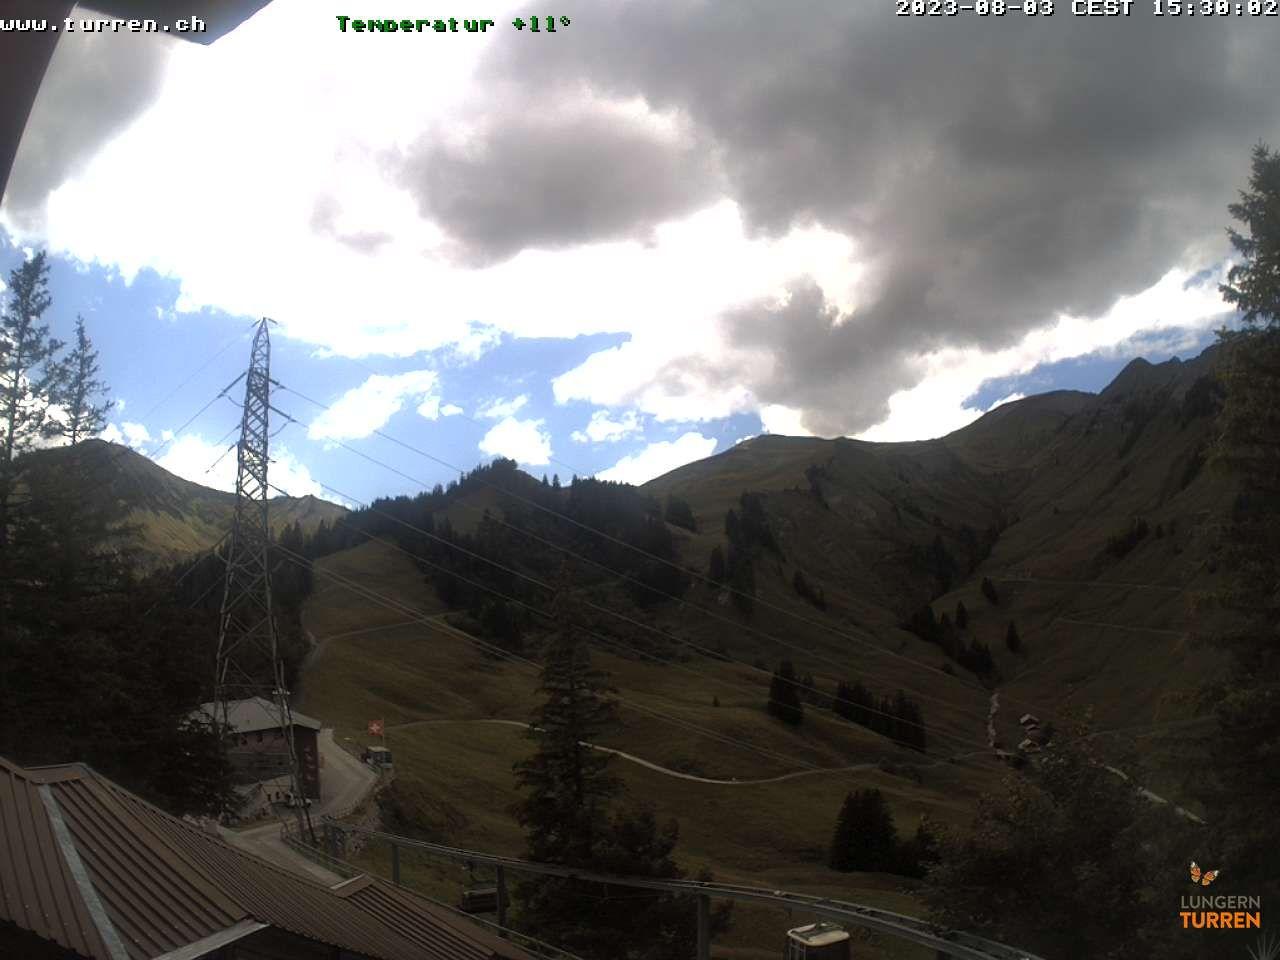 Lungern › West: Bergstation: Bergstation - Turren Bahn